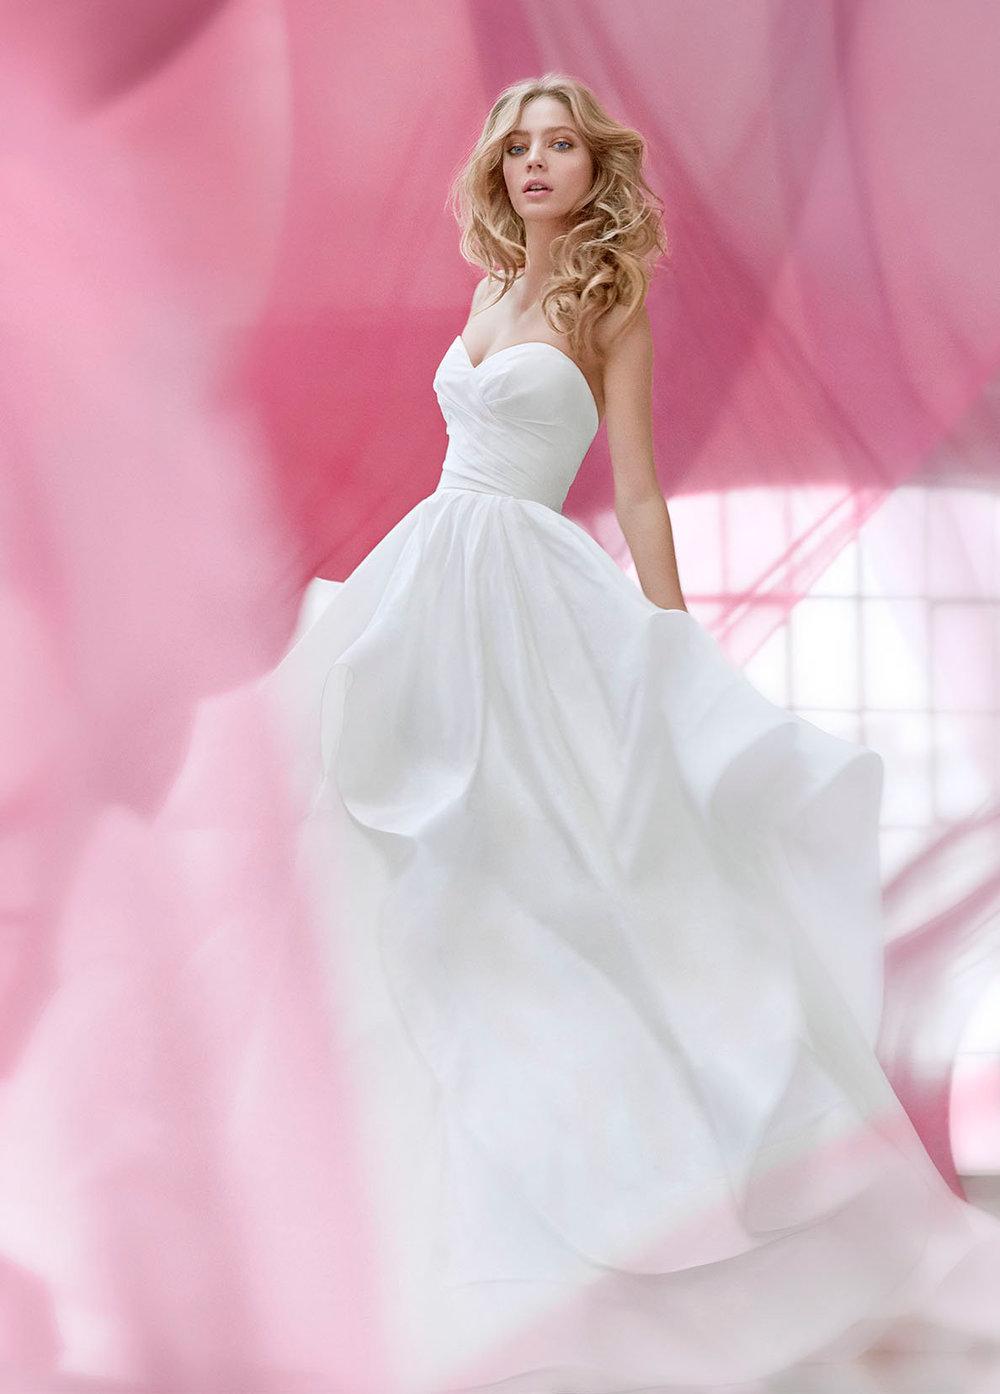 BlushHayleyPaigeBridal-BridesbyYoung-PlusSizeWeddingDress-Apollo1602.jpg